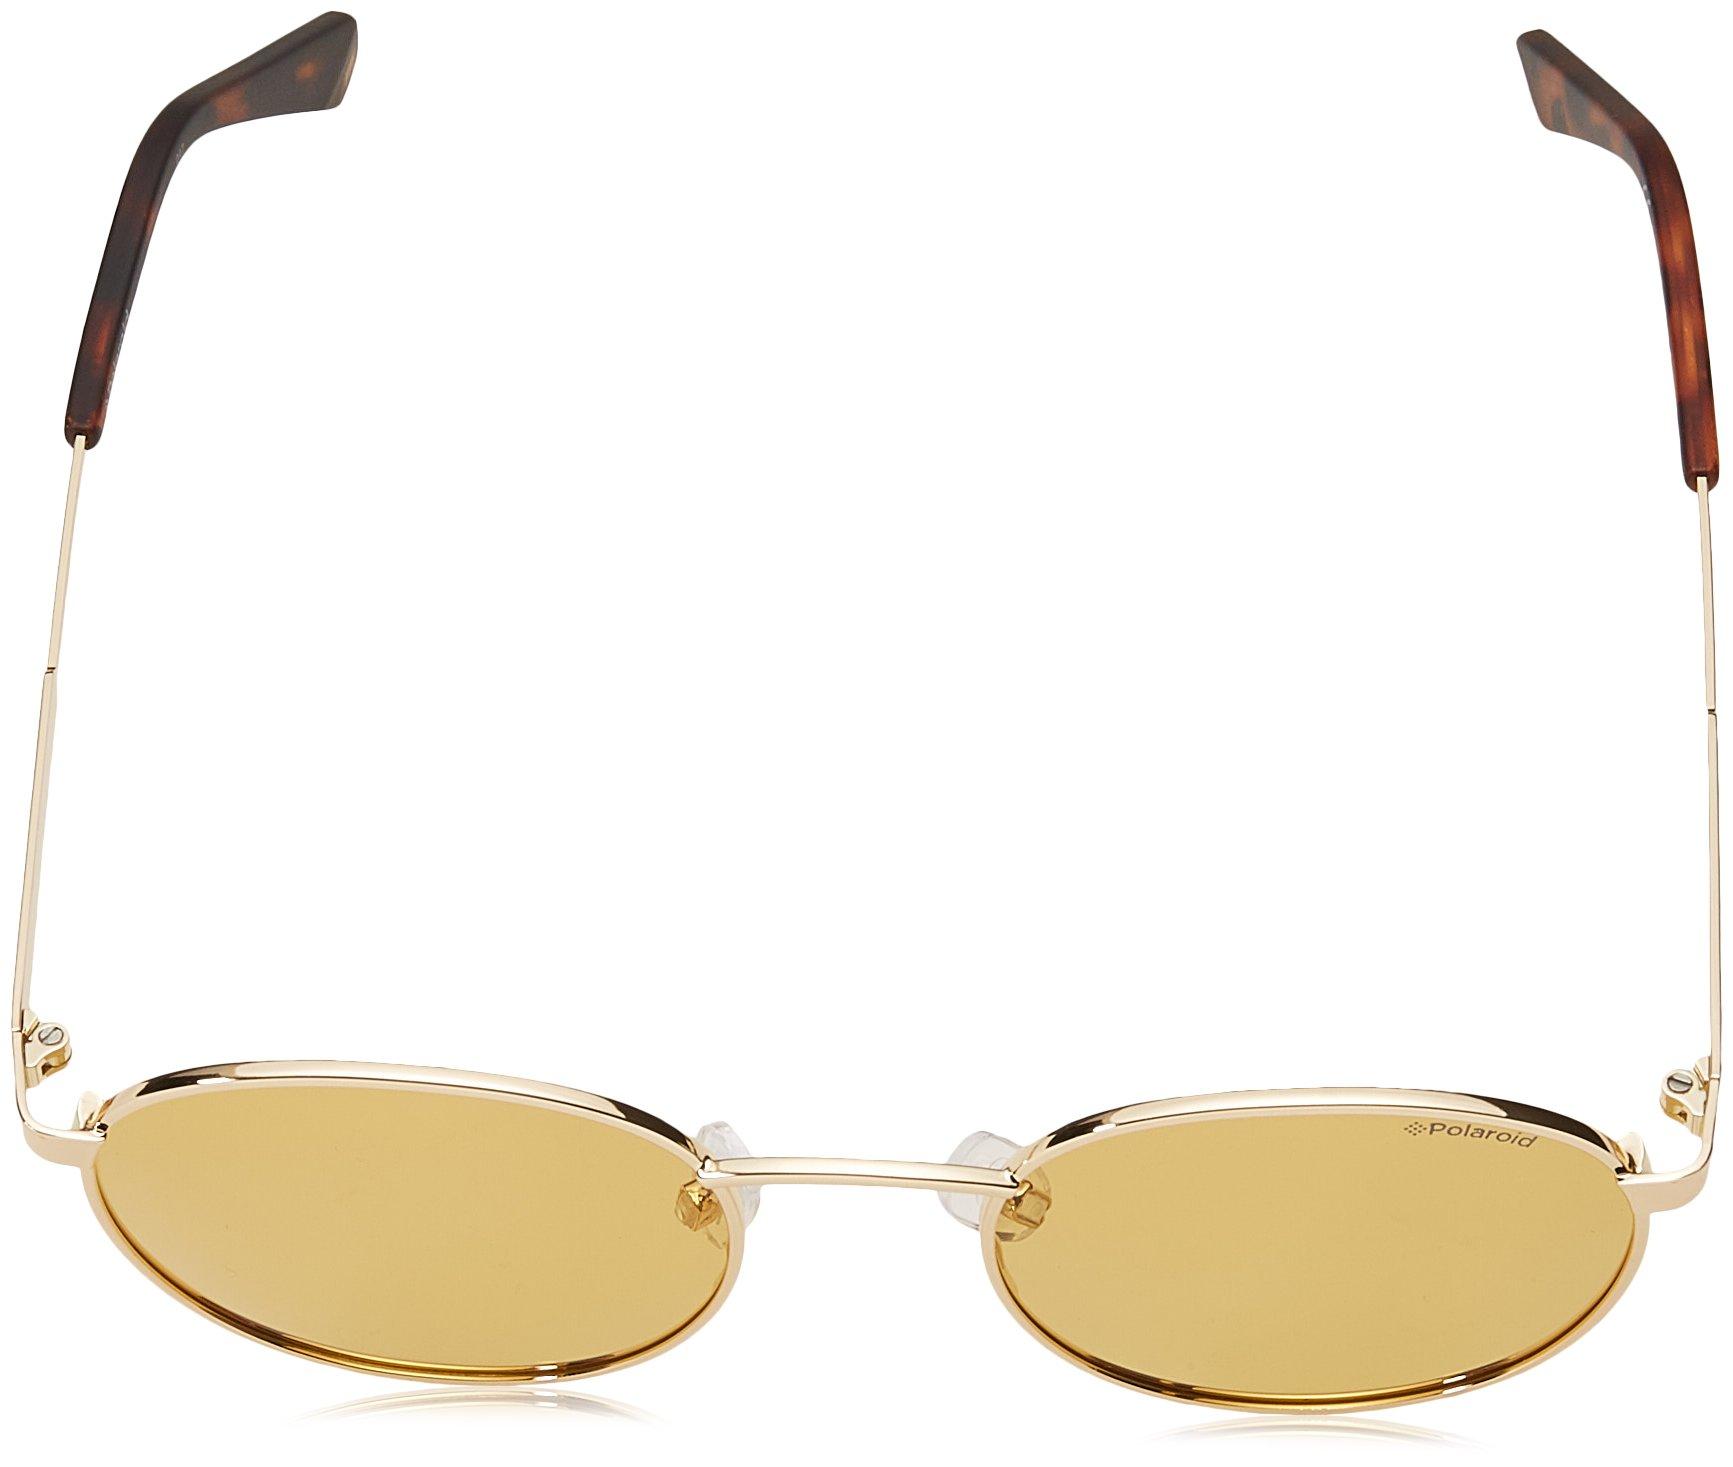 Polaroid Occhiali da Sole Unisex Modello 2053/S 5 spesavip